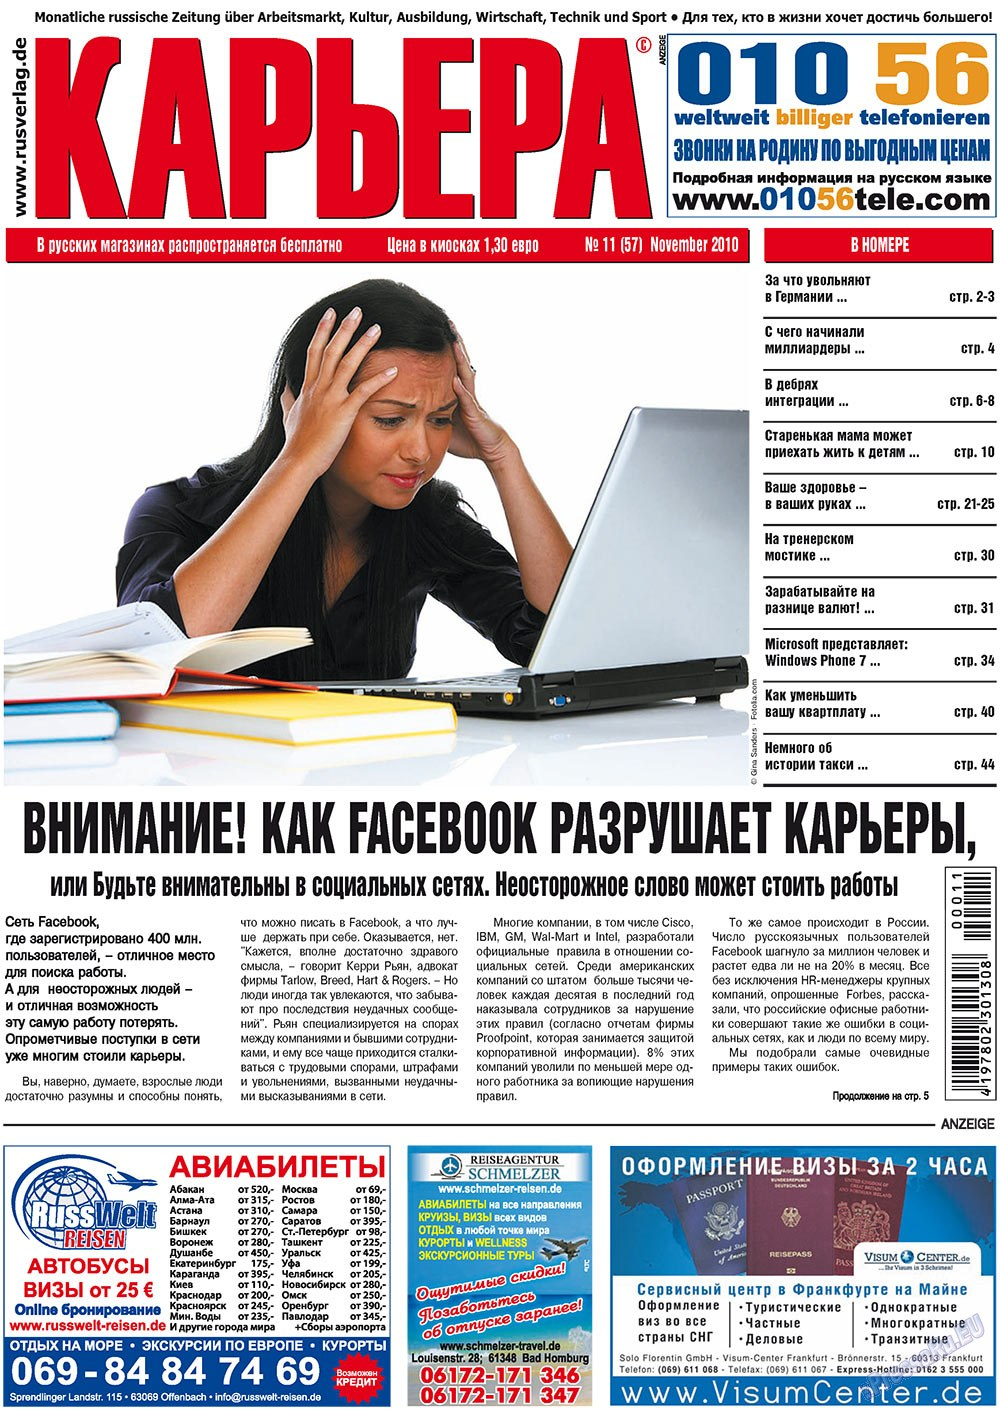 Карьера (газета). 2010 год, номер 11, стр. 1